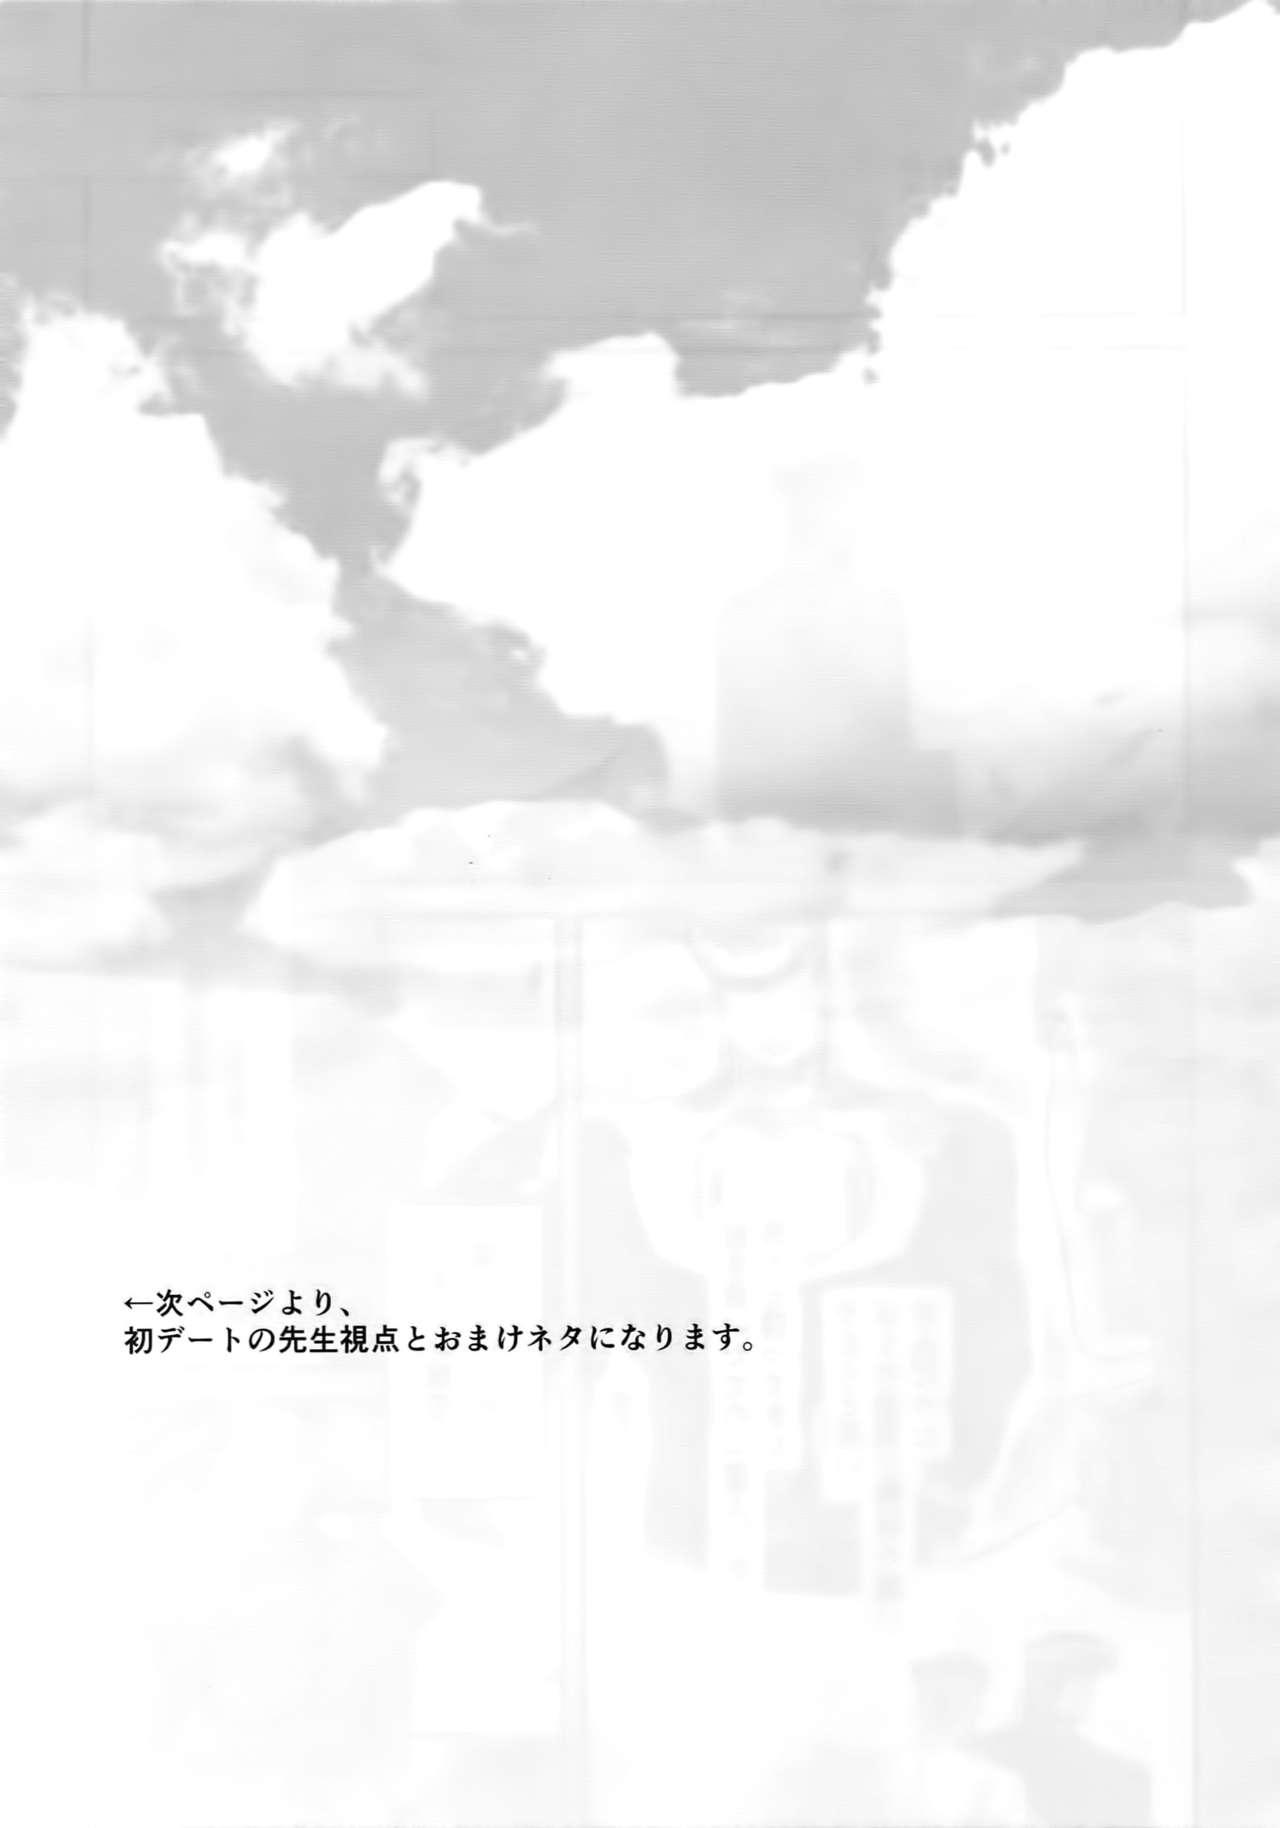 NuruNuru JoRo Sairokubon 91